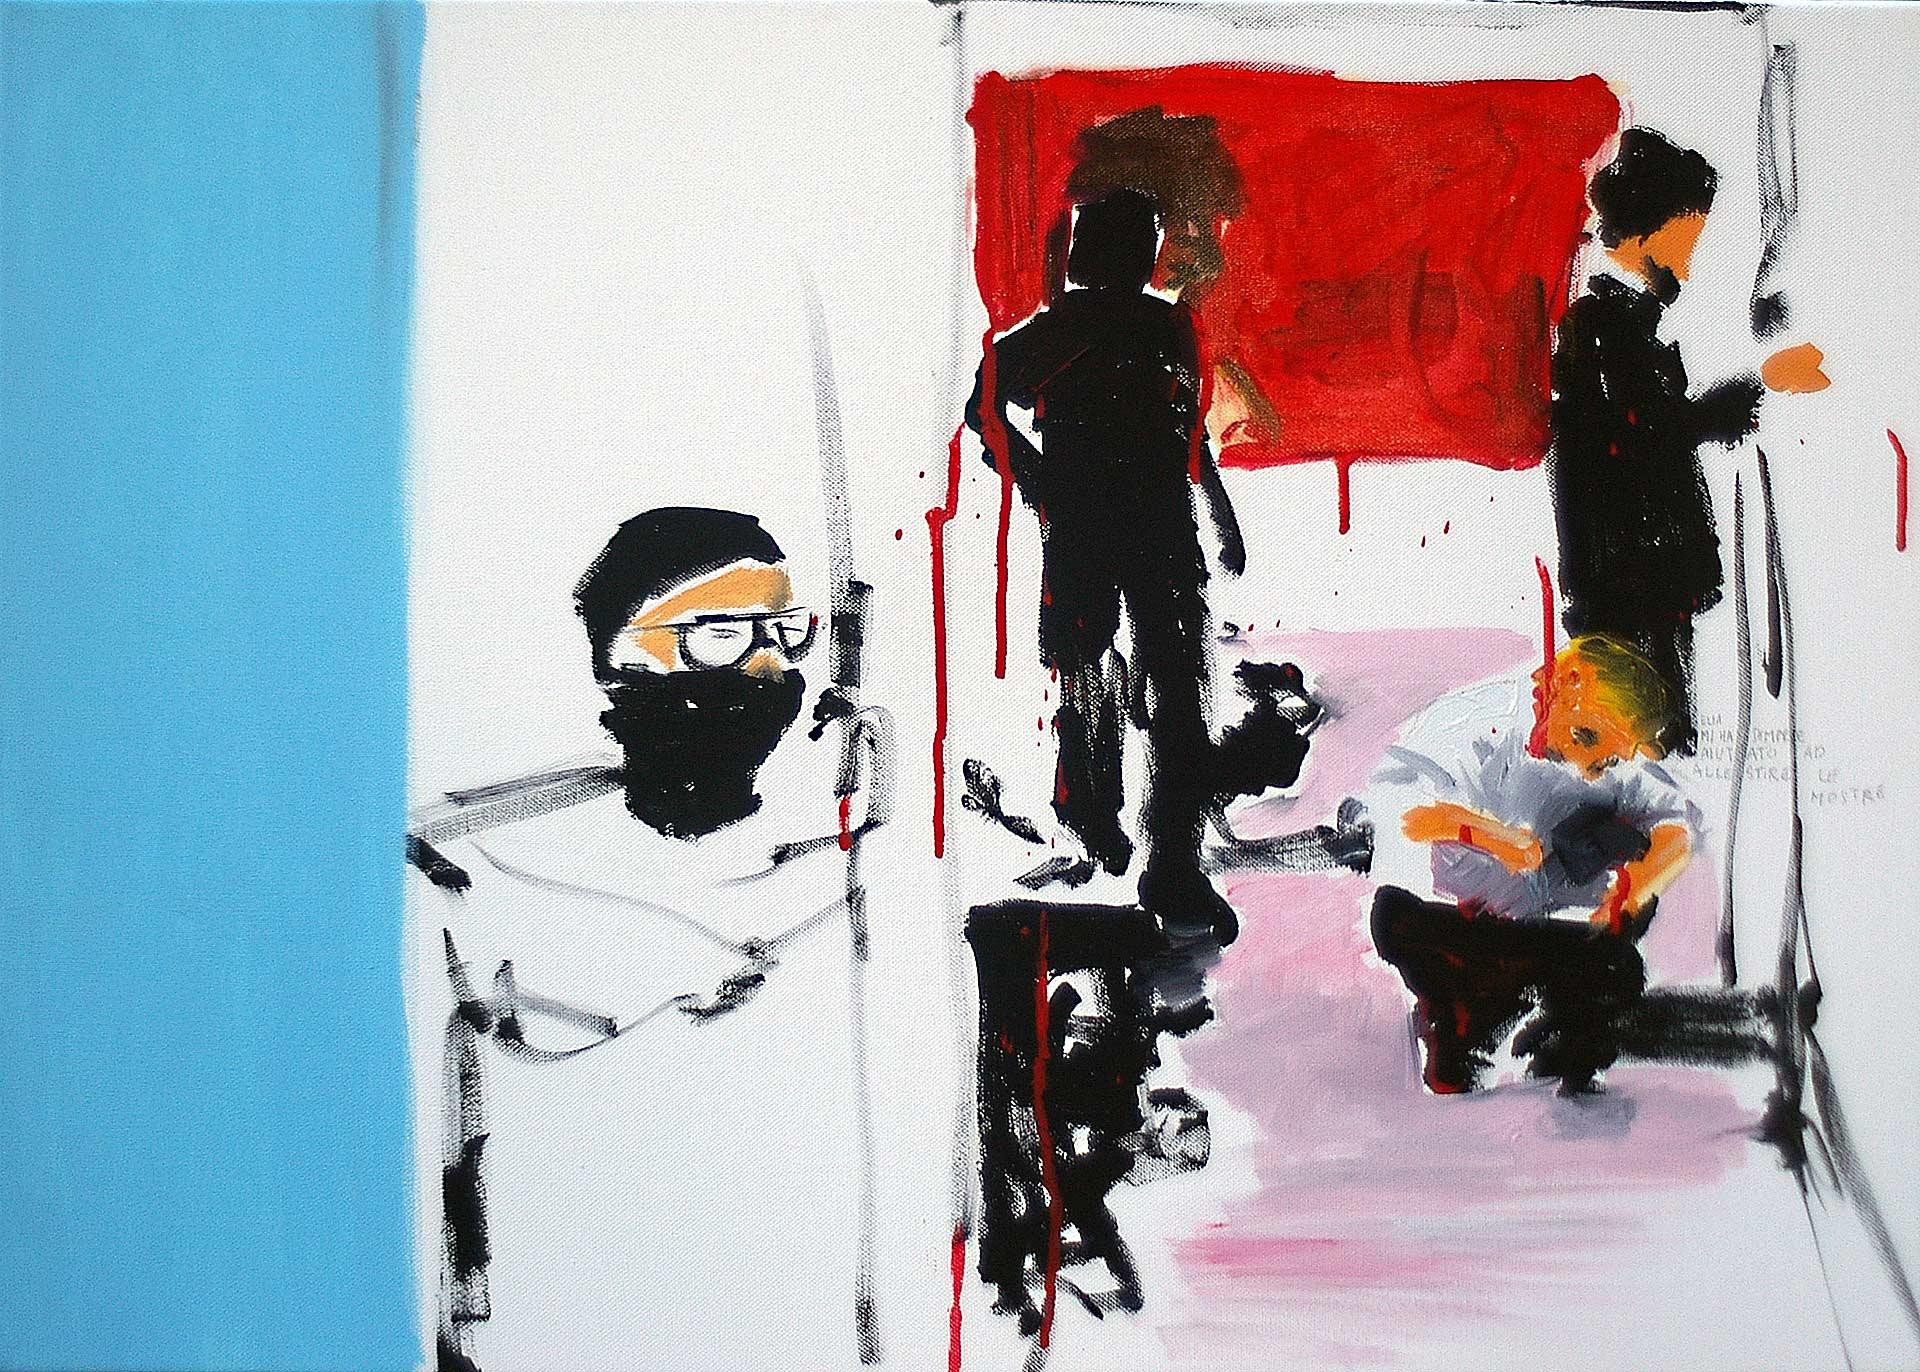 UP0905 (Elia) 2009, acrylic on canvas, 70 x 100 cm.